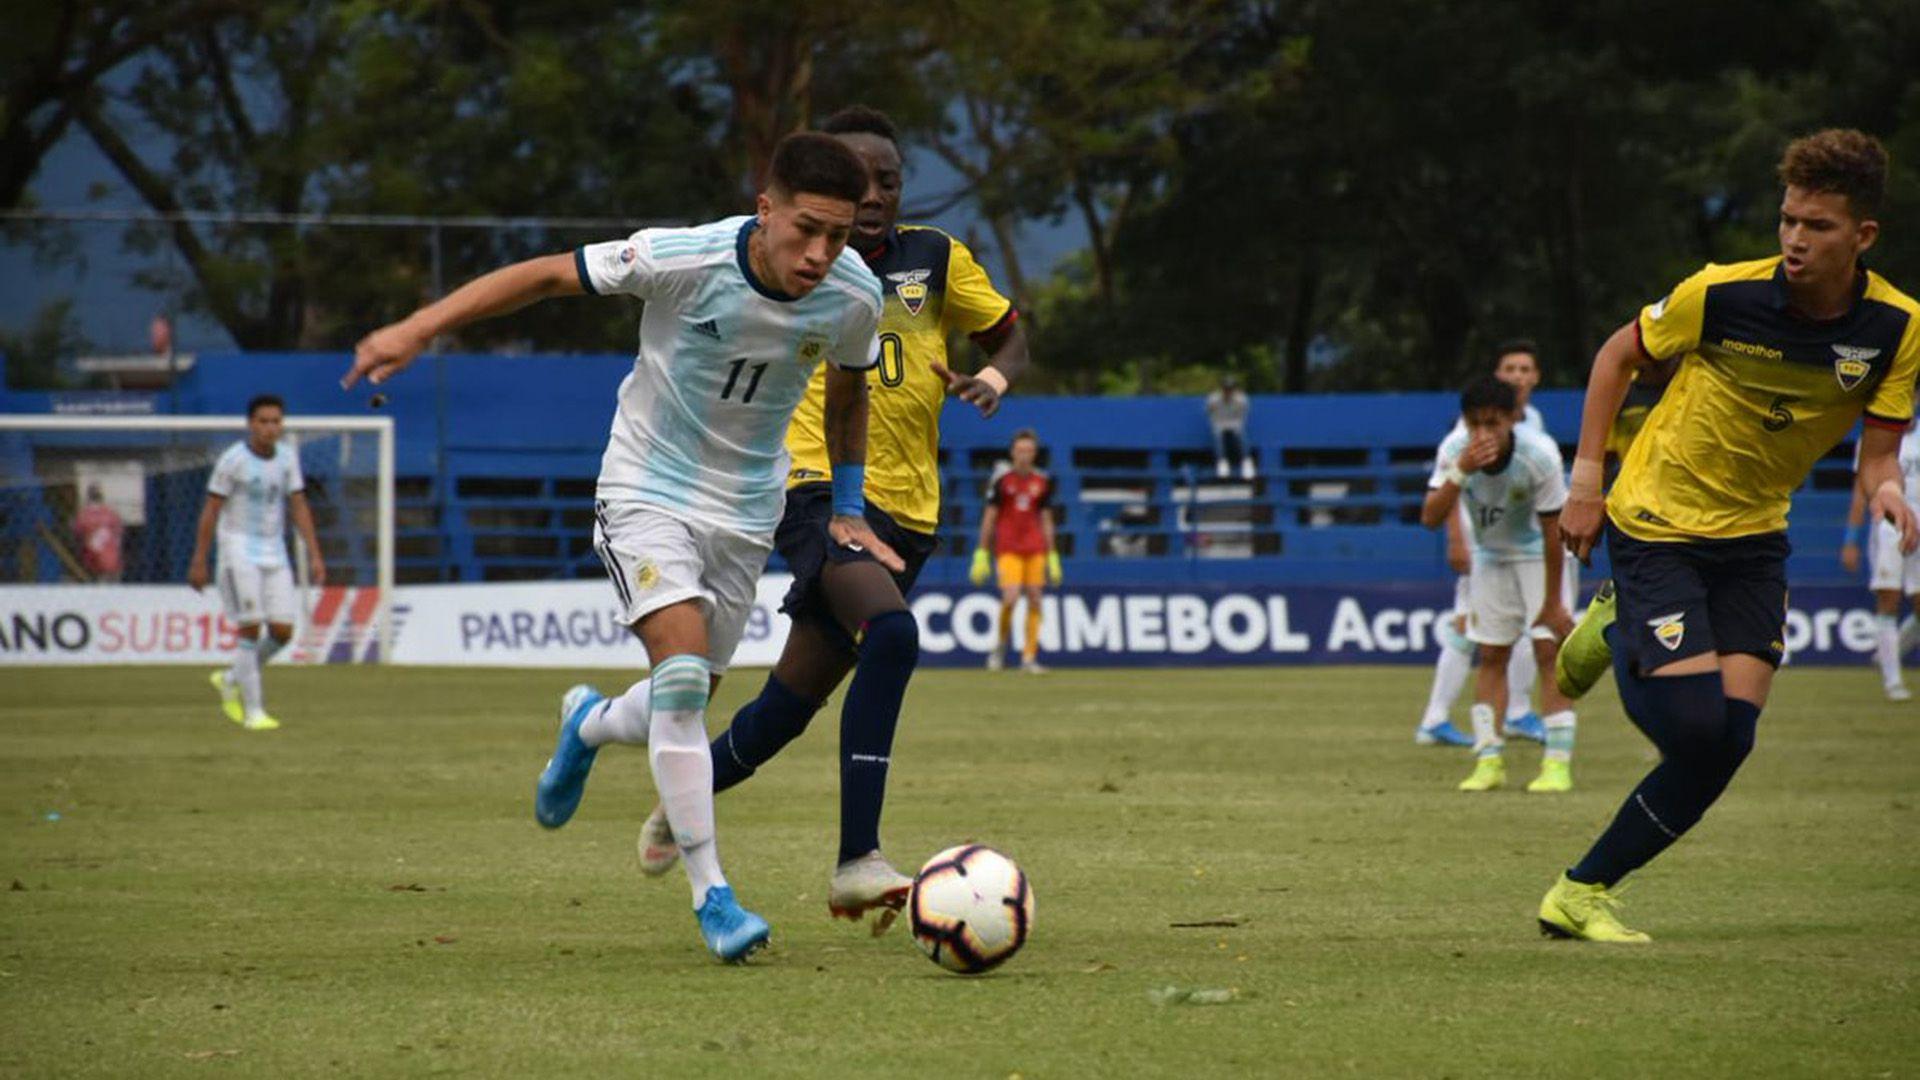 El equipo albiceleste viene de vencer a Ecuador (Selección Argentina)